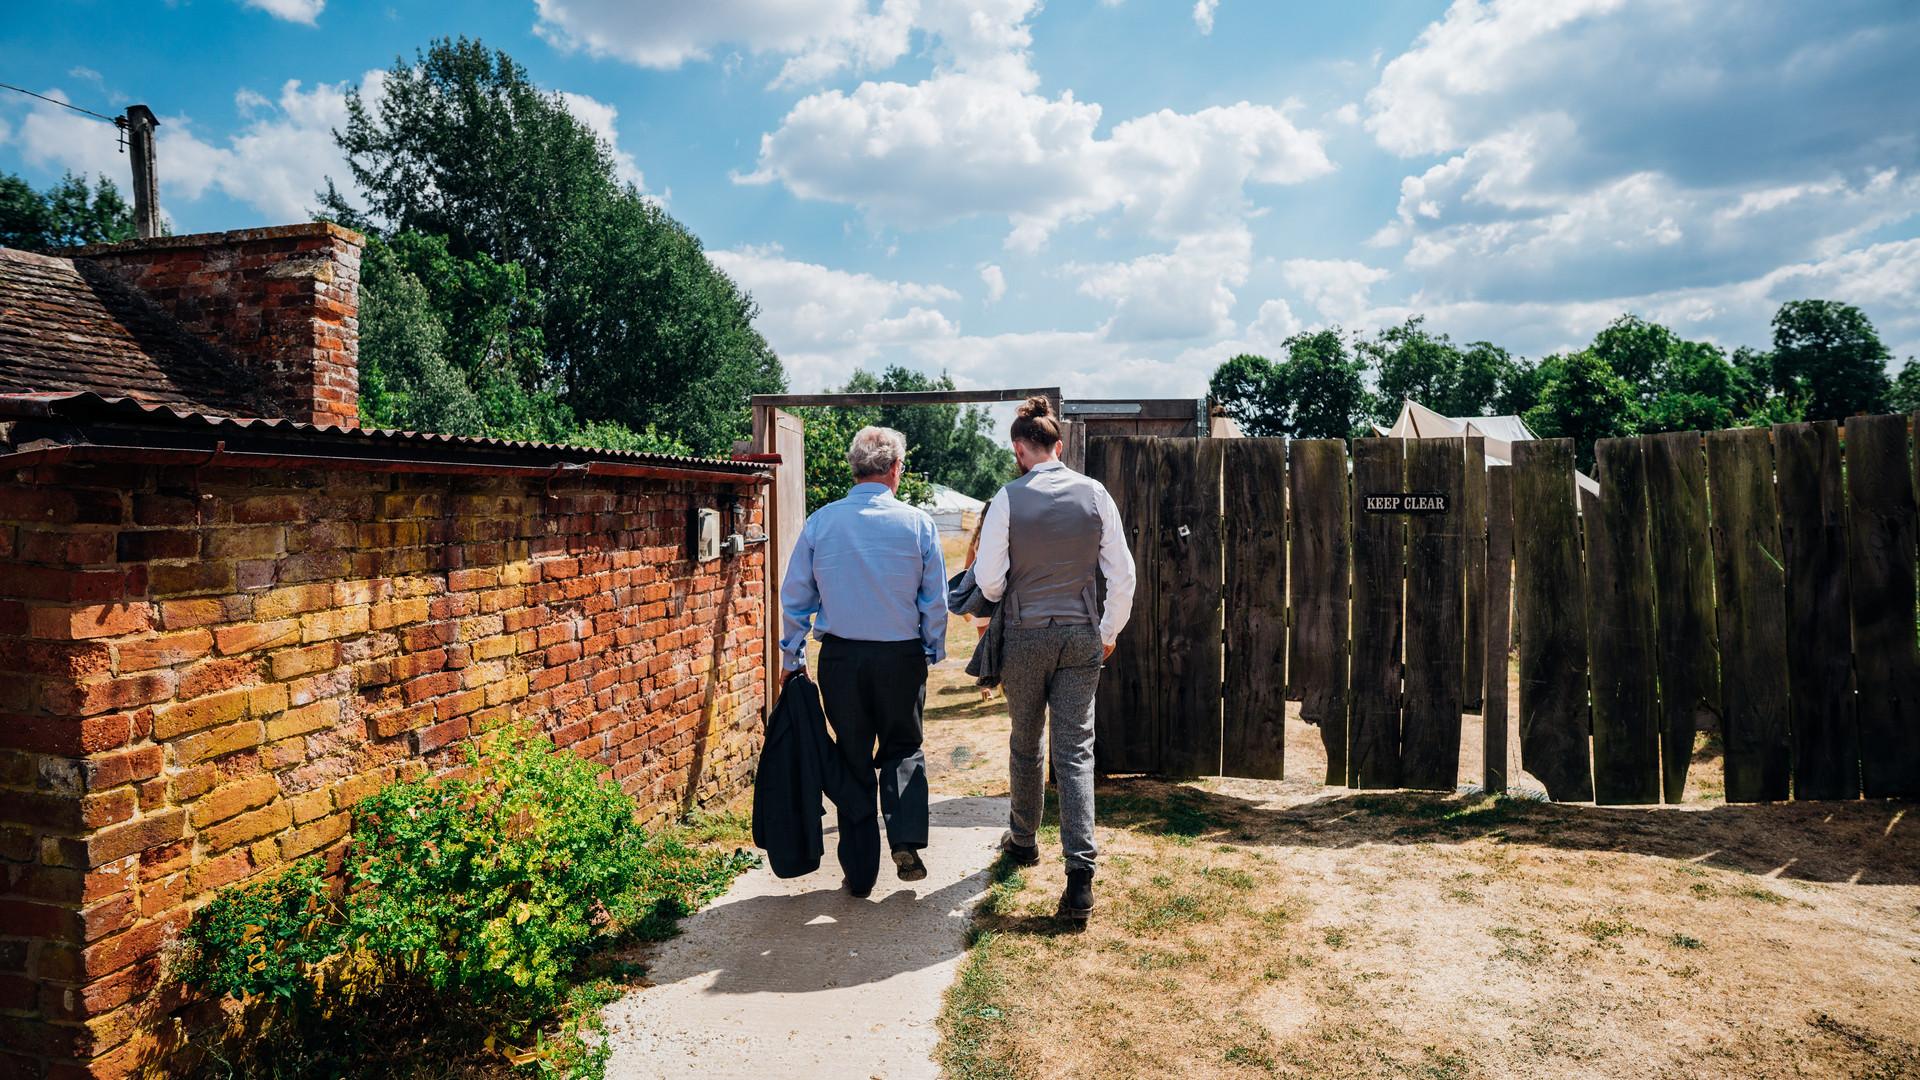 Entering the (secret) walled garden